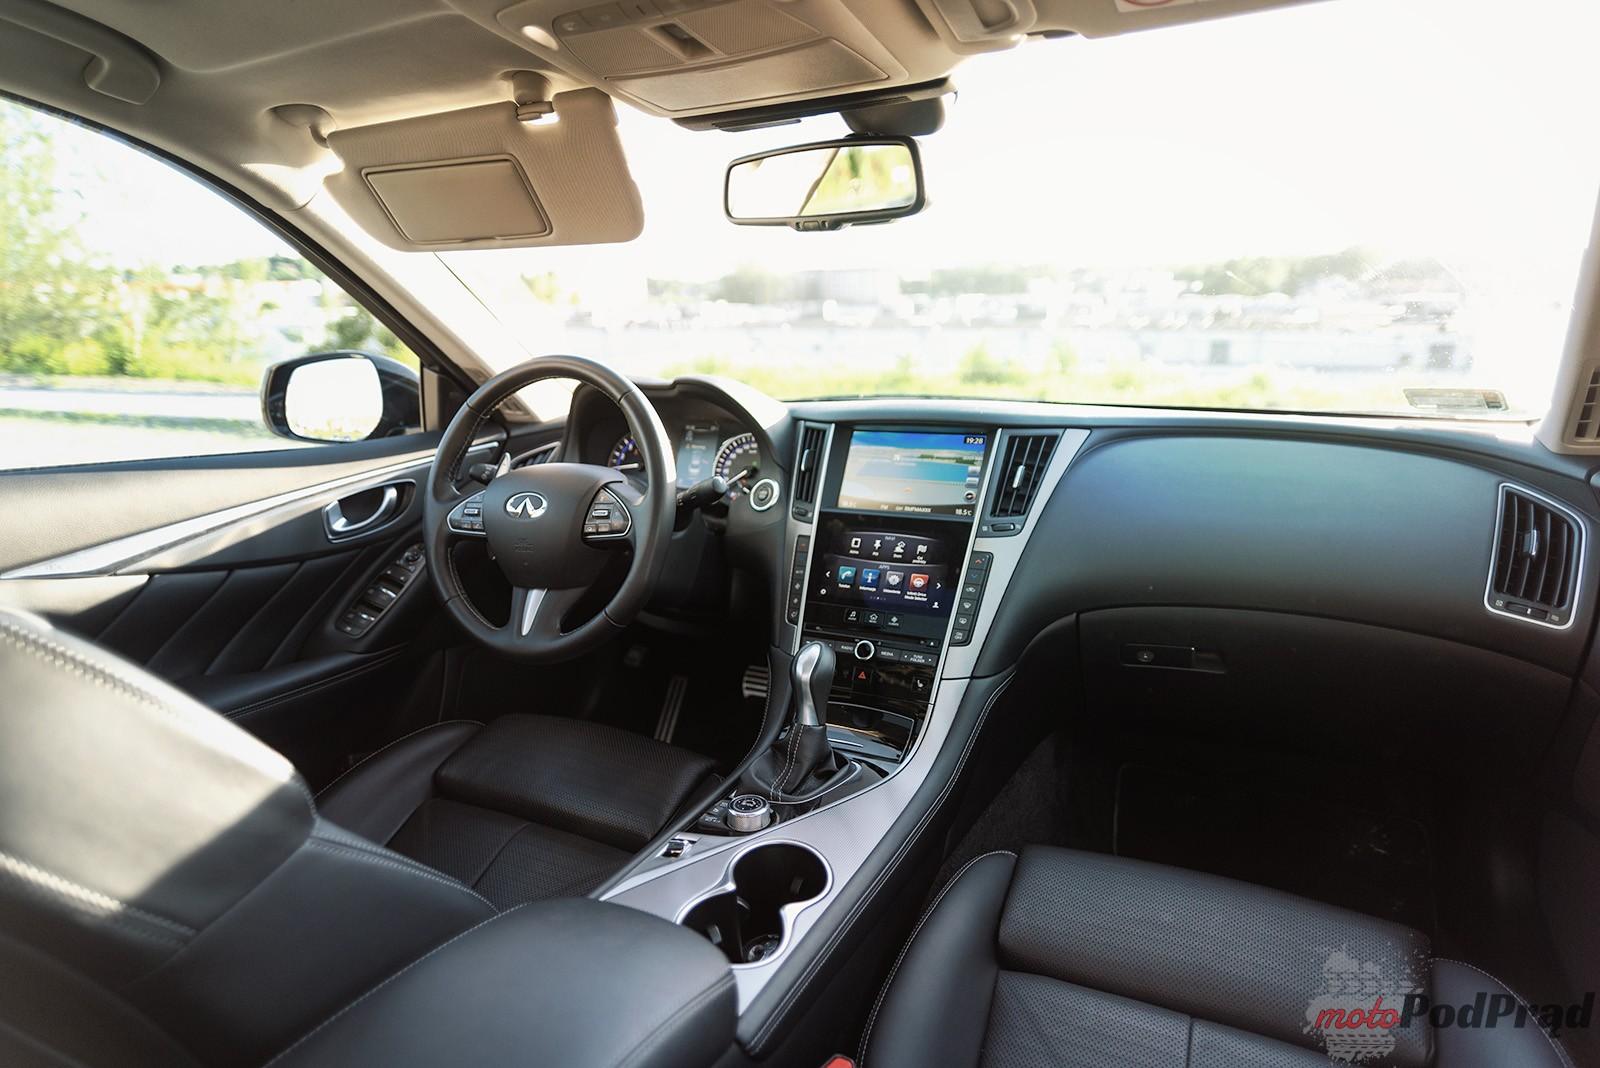 Infiniti Q50 21 Test: Infiniti Q50 S Hybrid   nie tylko Europa